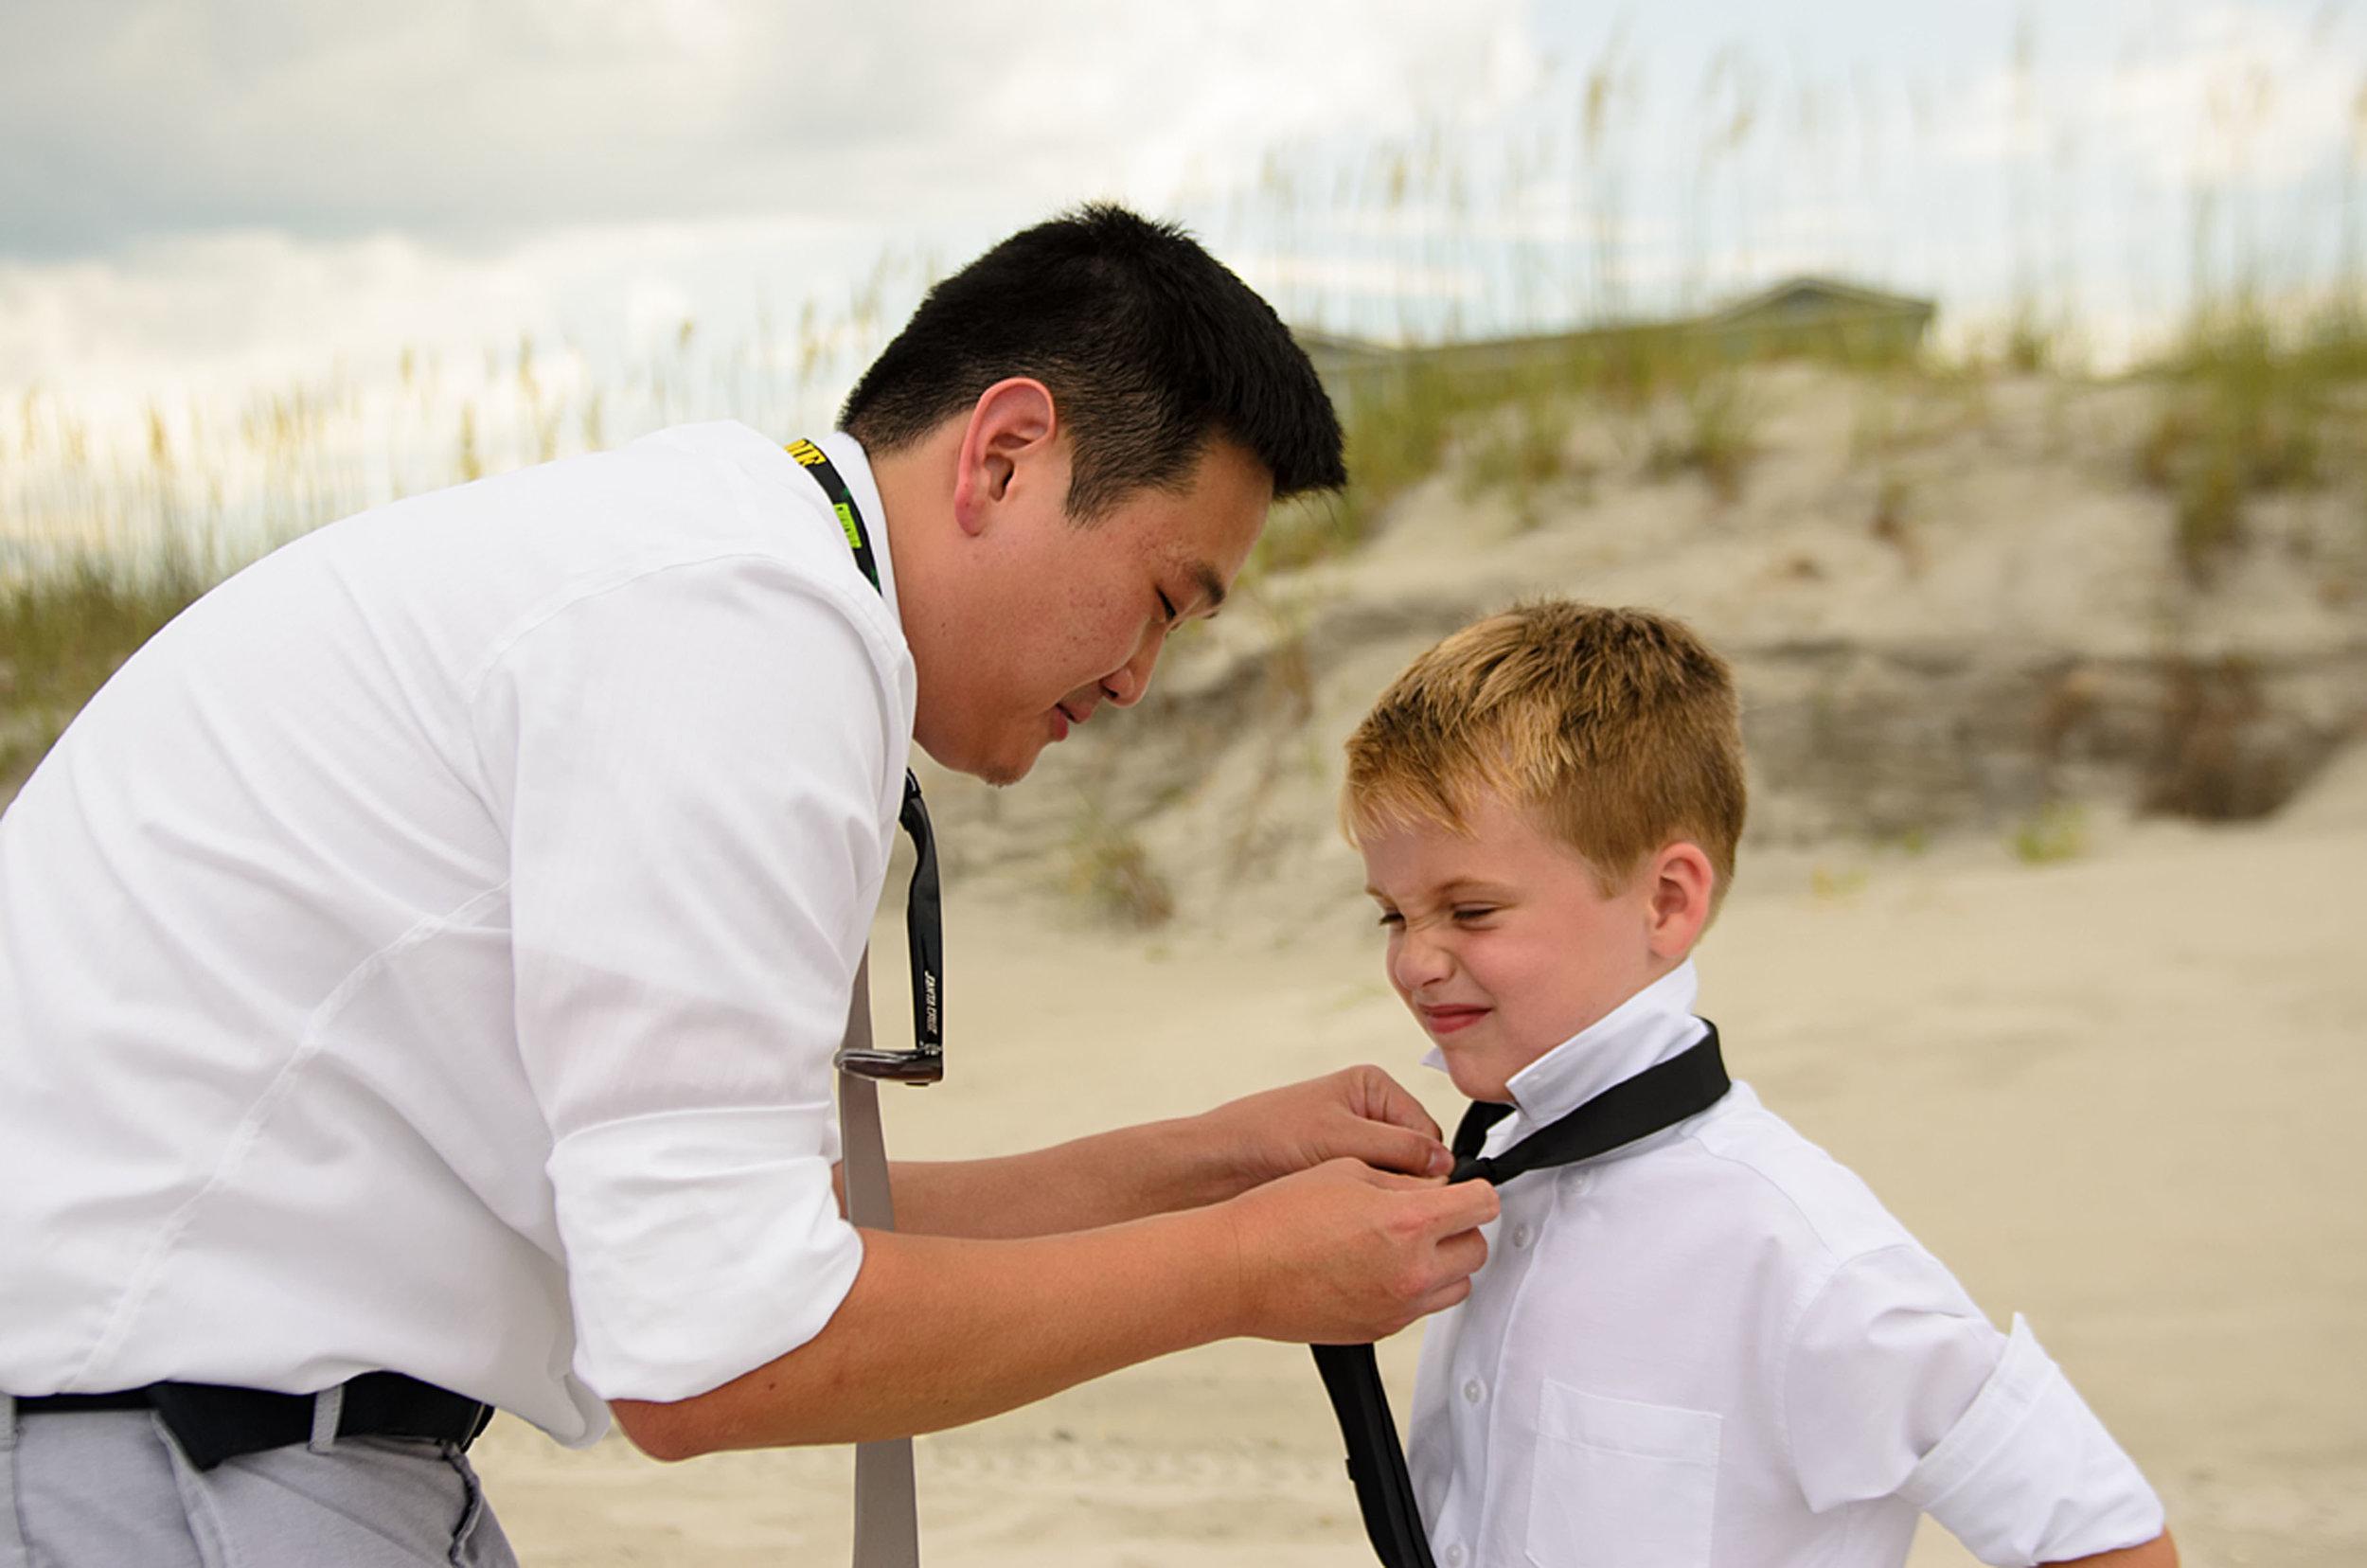 North_Carolina_Wedding_Photographer_Tiffany_Abruzzo_Ceremony_004.jpg